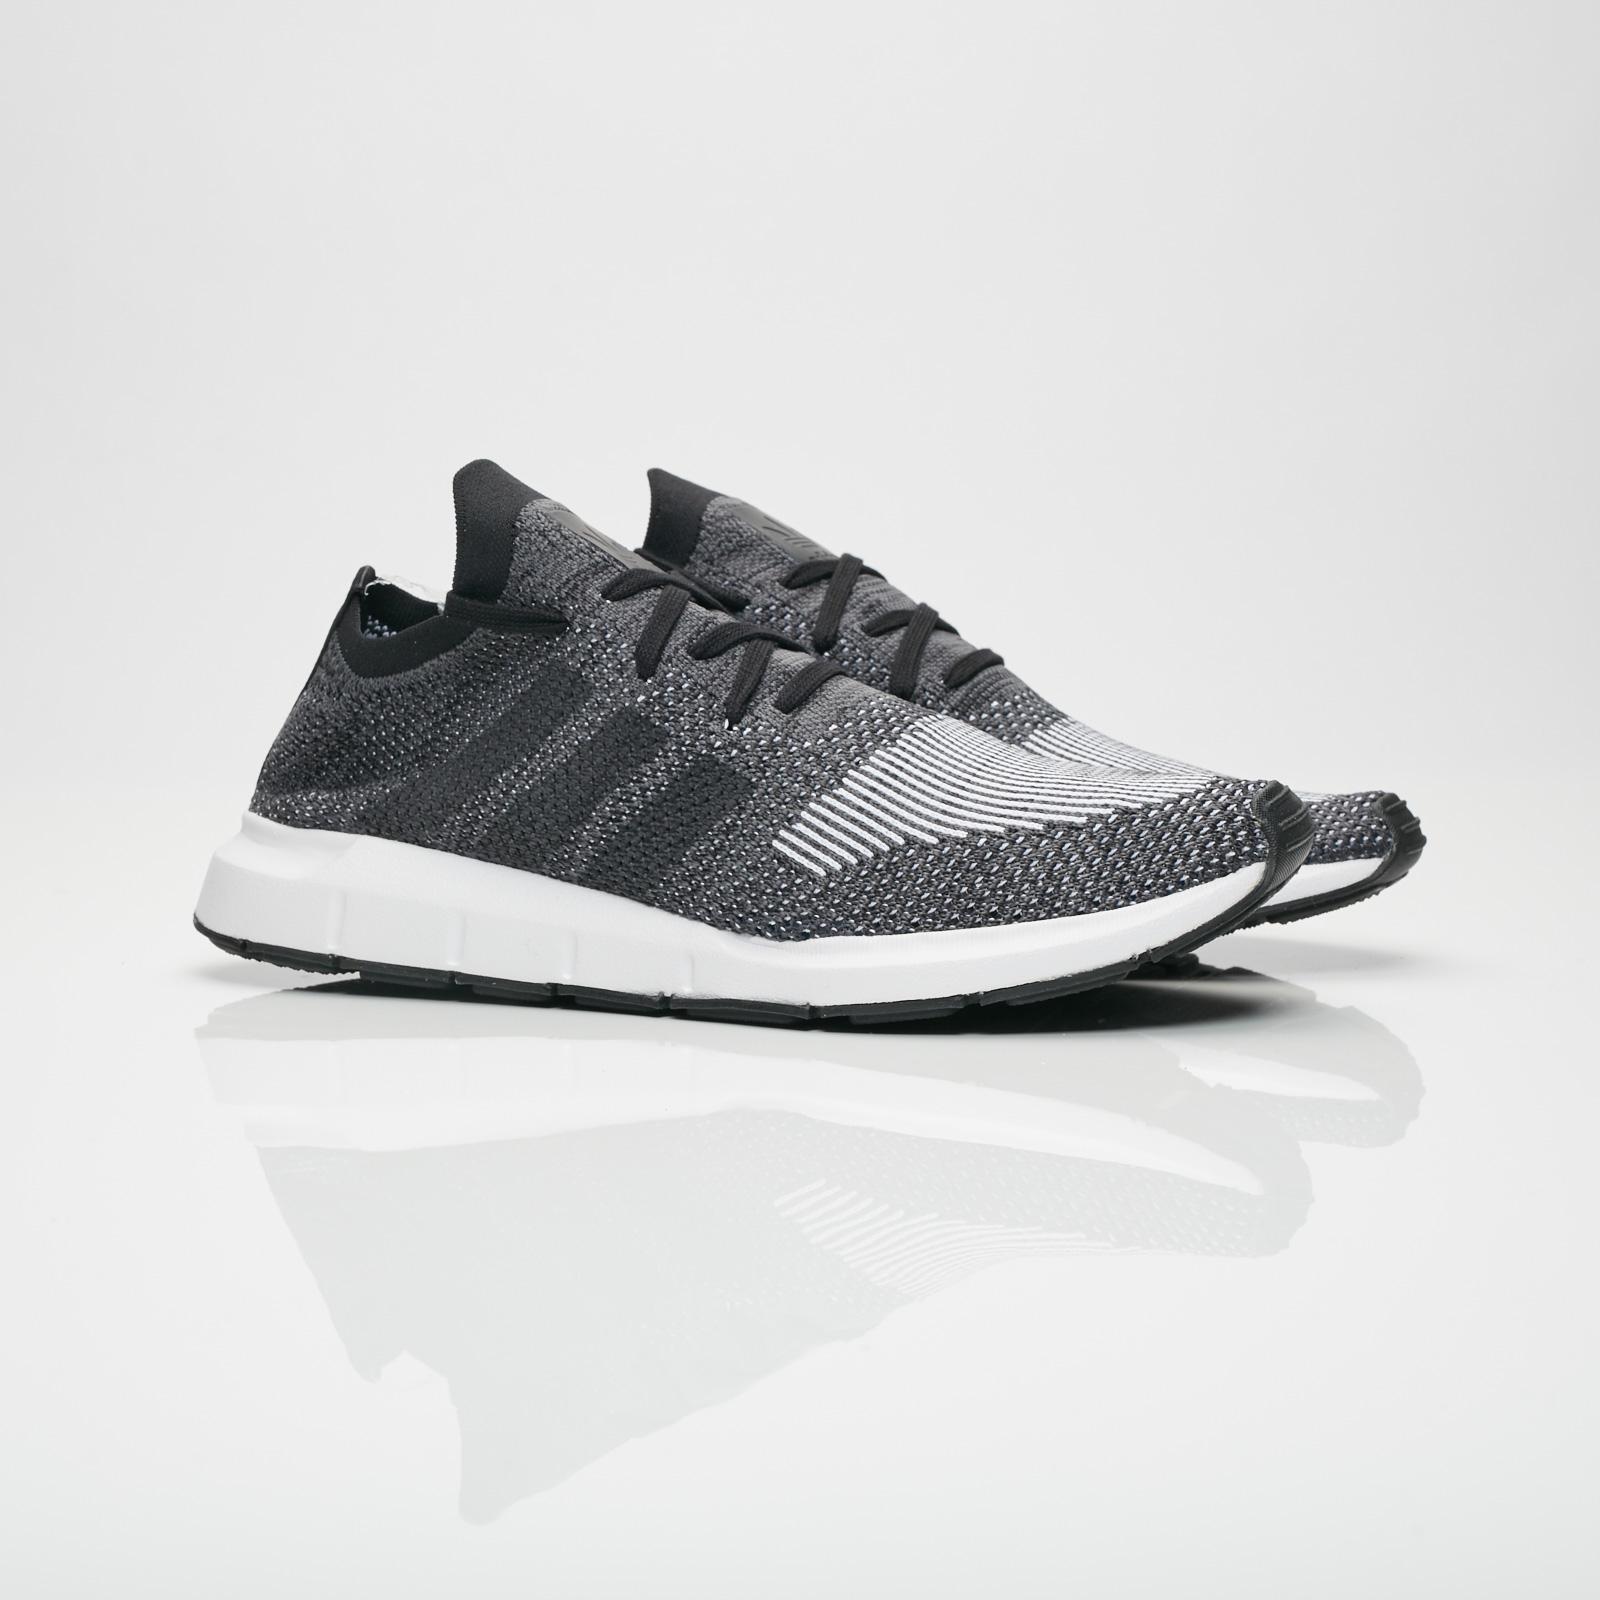 Adidas Swift Run Pk Ginnasticanstuff Cq2889 Scarpe da Ginnasticanstuff Pk Scarpe 0a29df